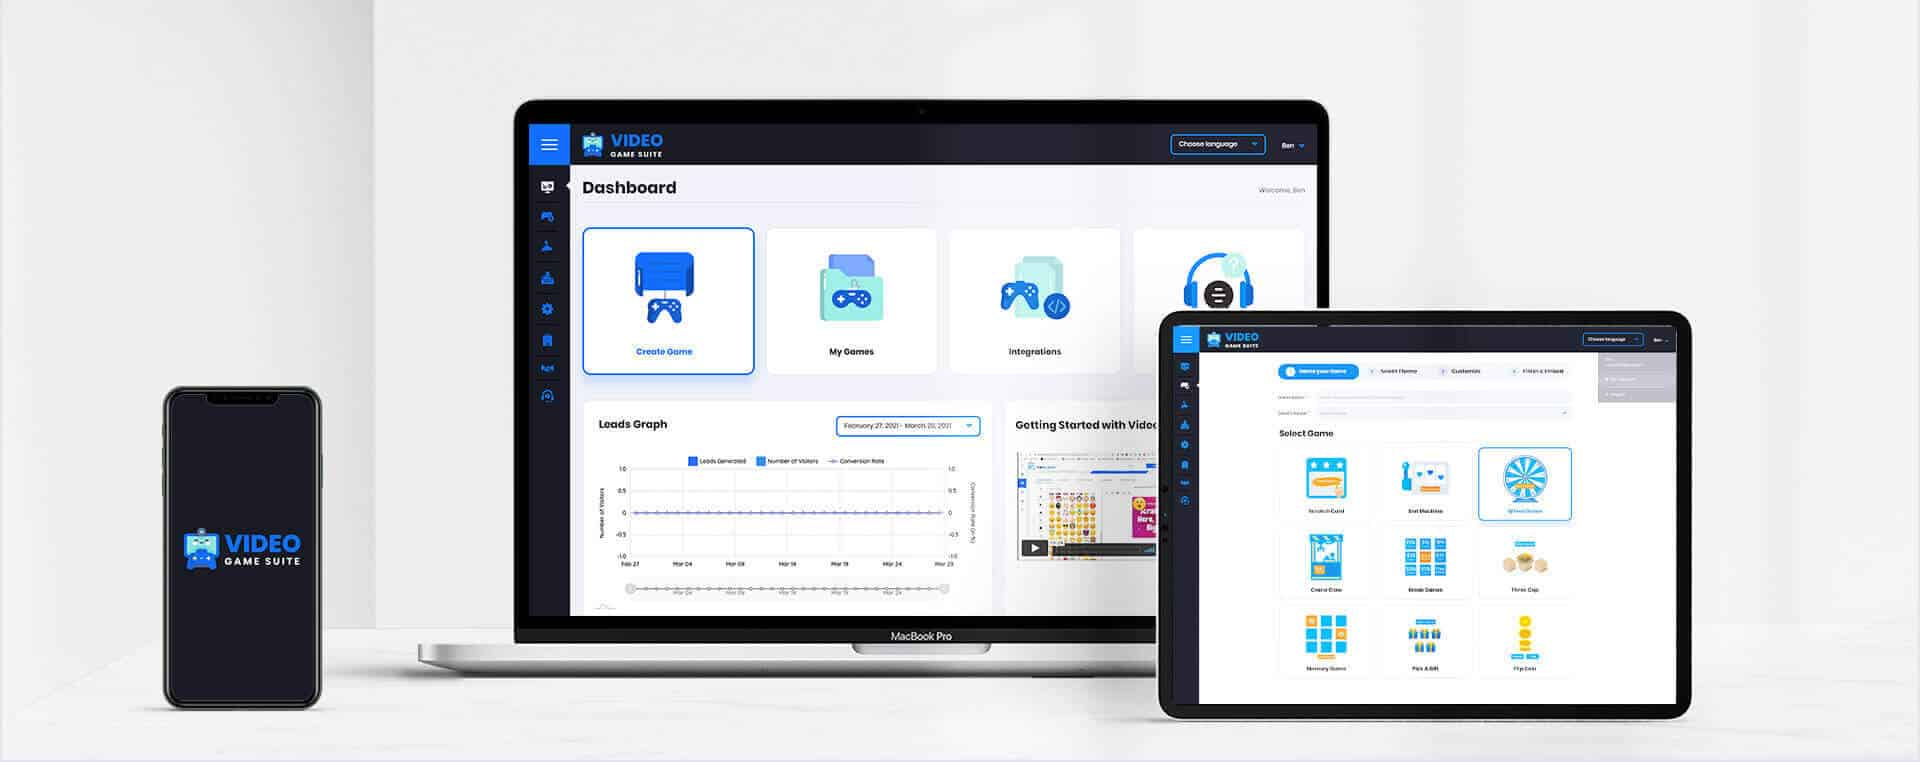 VideoGameSuite Enterprise Video Gamification Marketing Tool Lifetime Deal